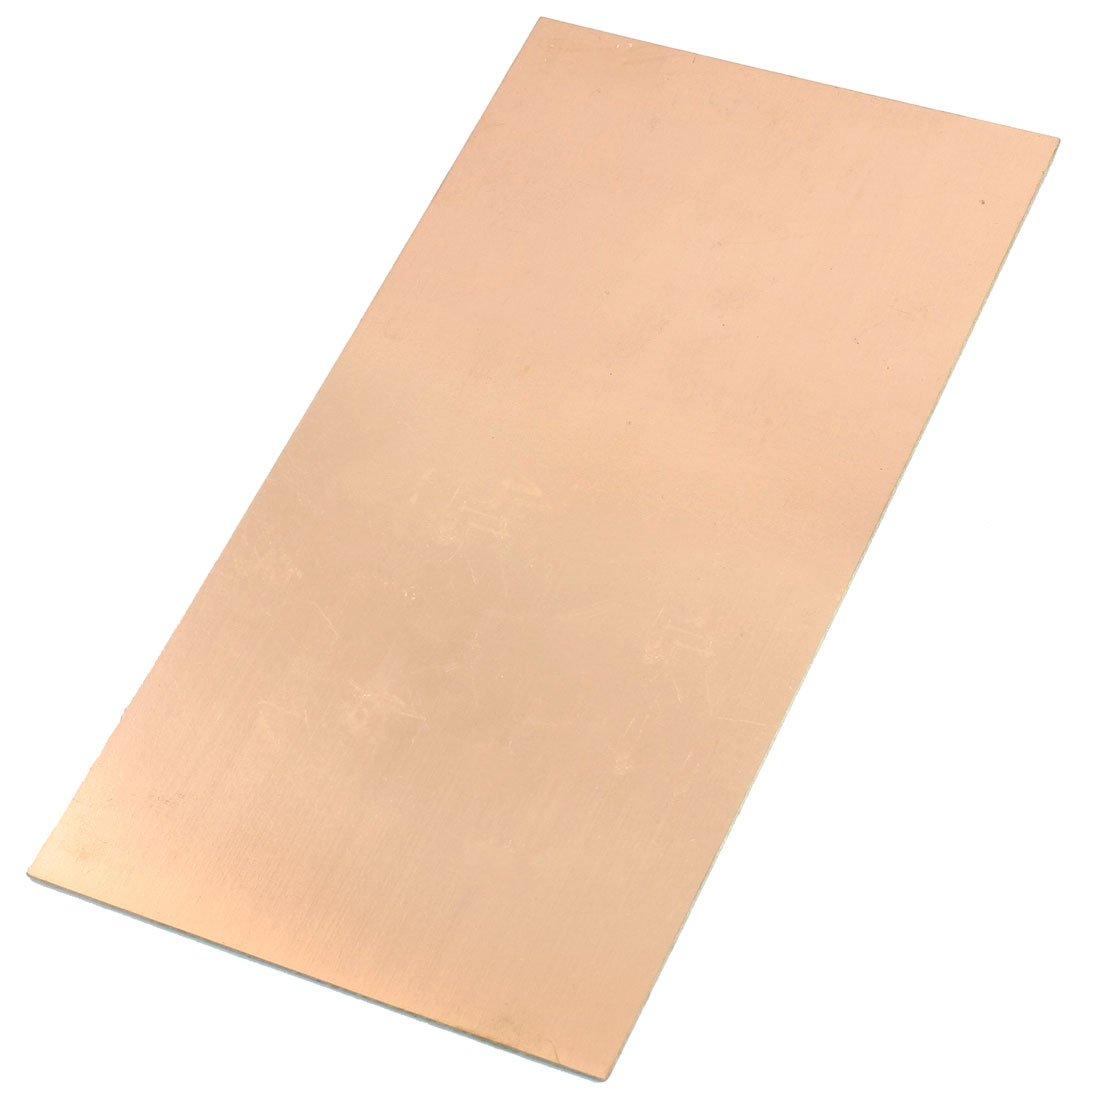 Uxcell Rectangle Fr4 Copper Clad Laminate Pcb Printed Plain Copperclad Fibreglass Circuit Board Rapid Online 130x250mm Electronics